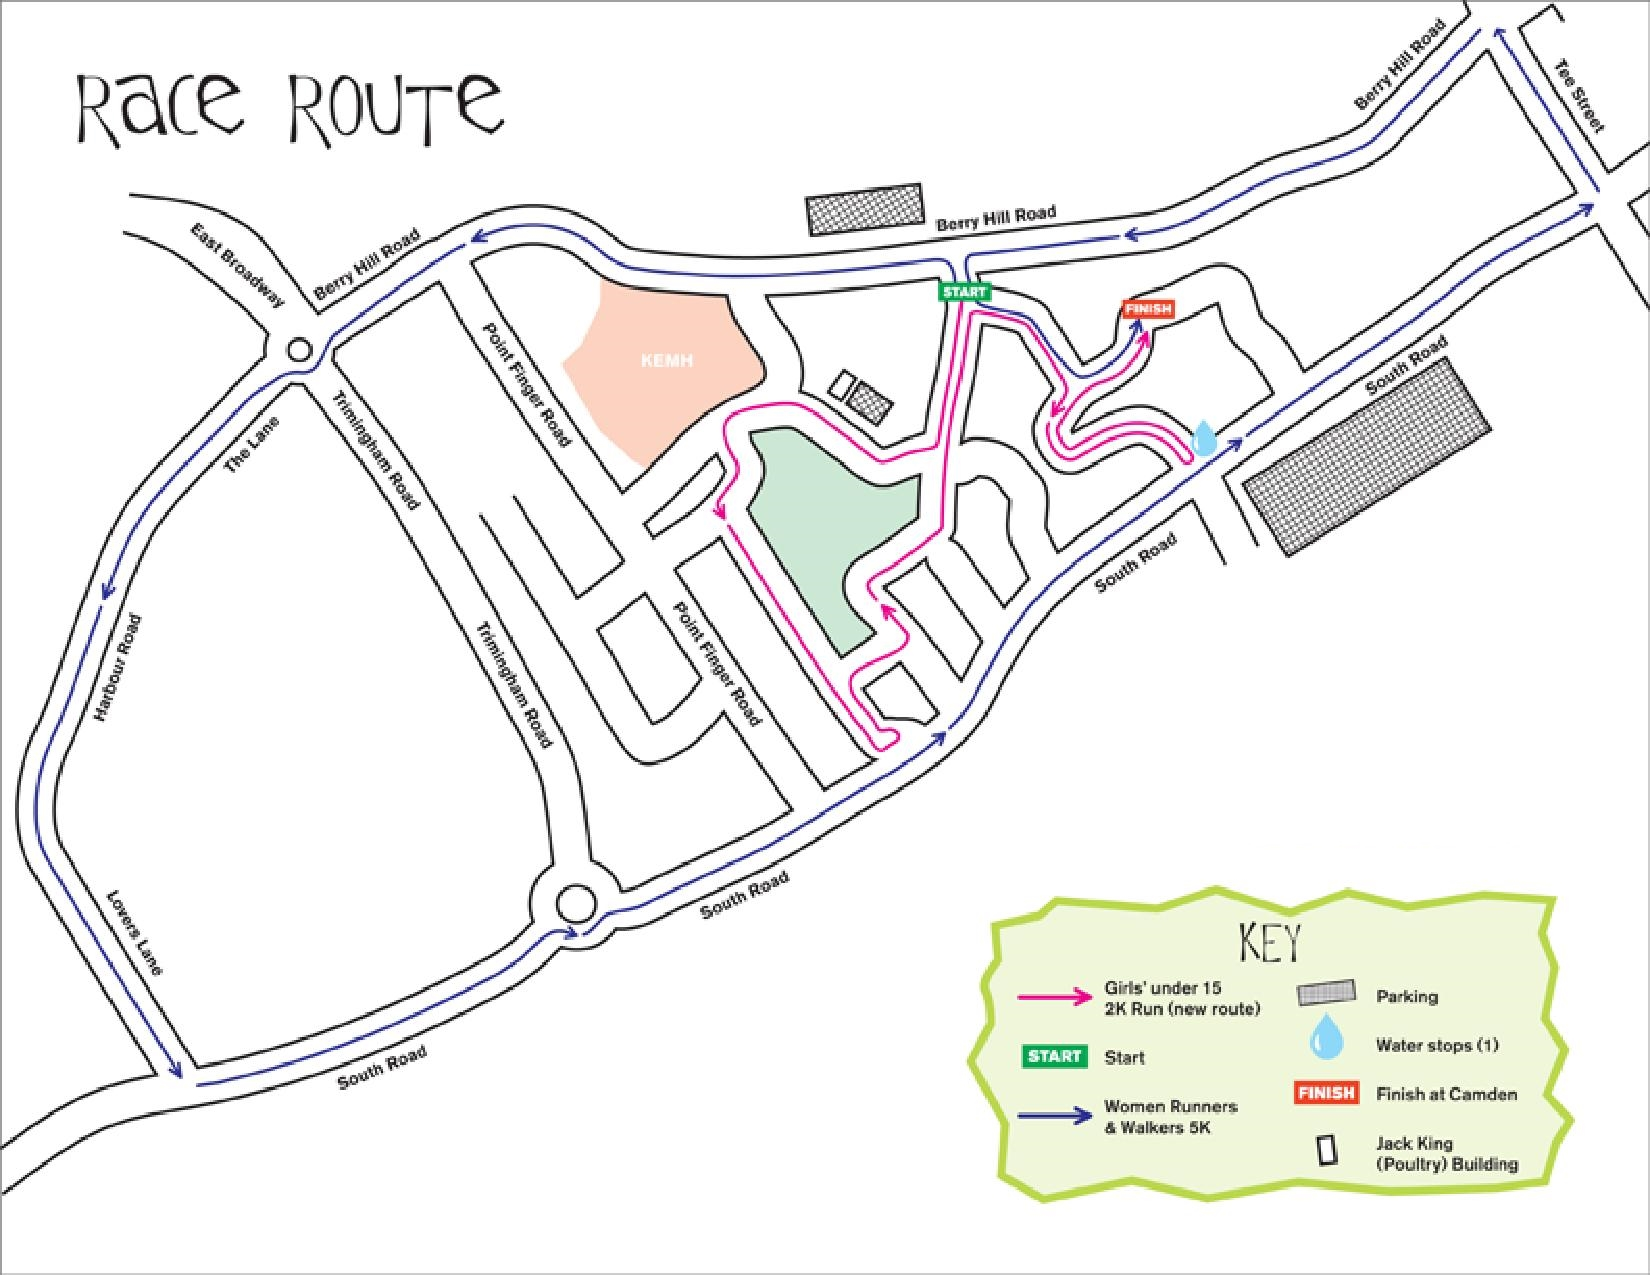 PartnerRe routemap